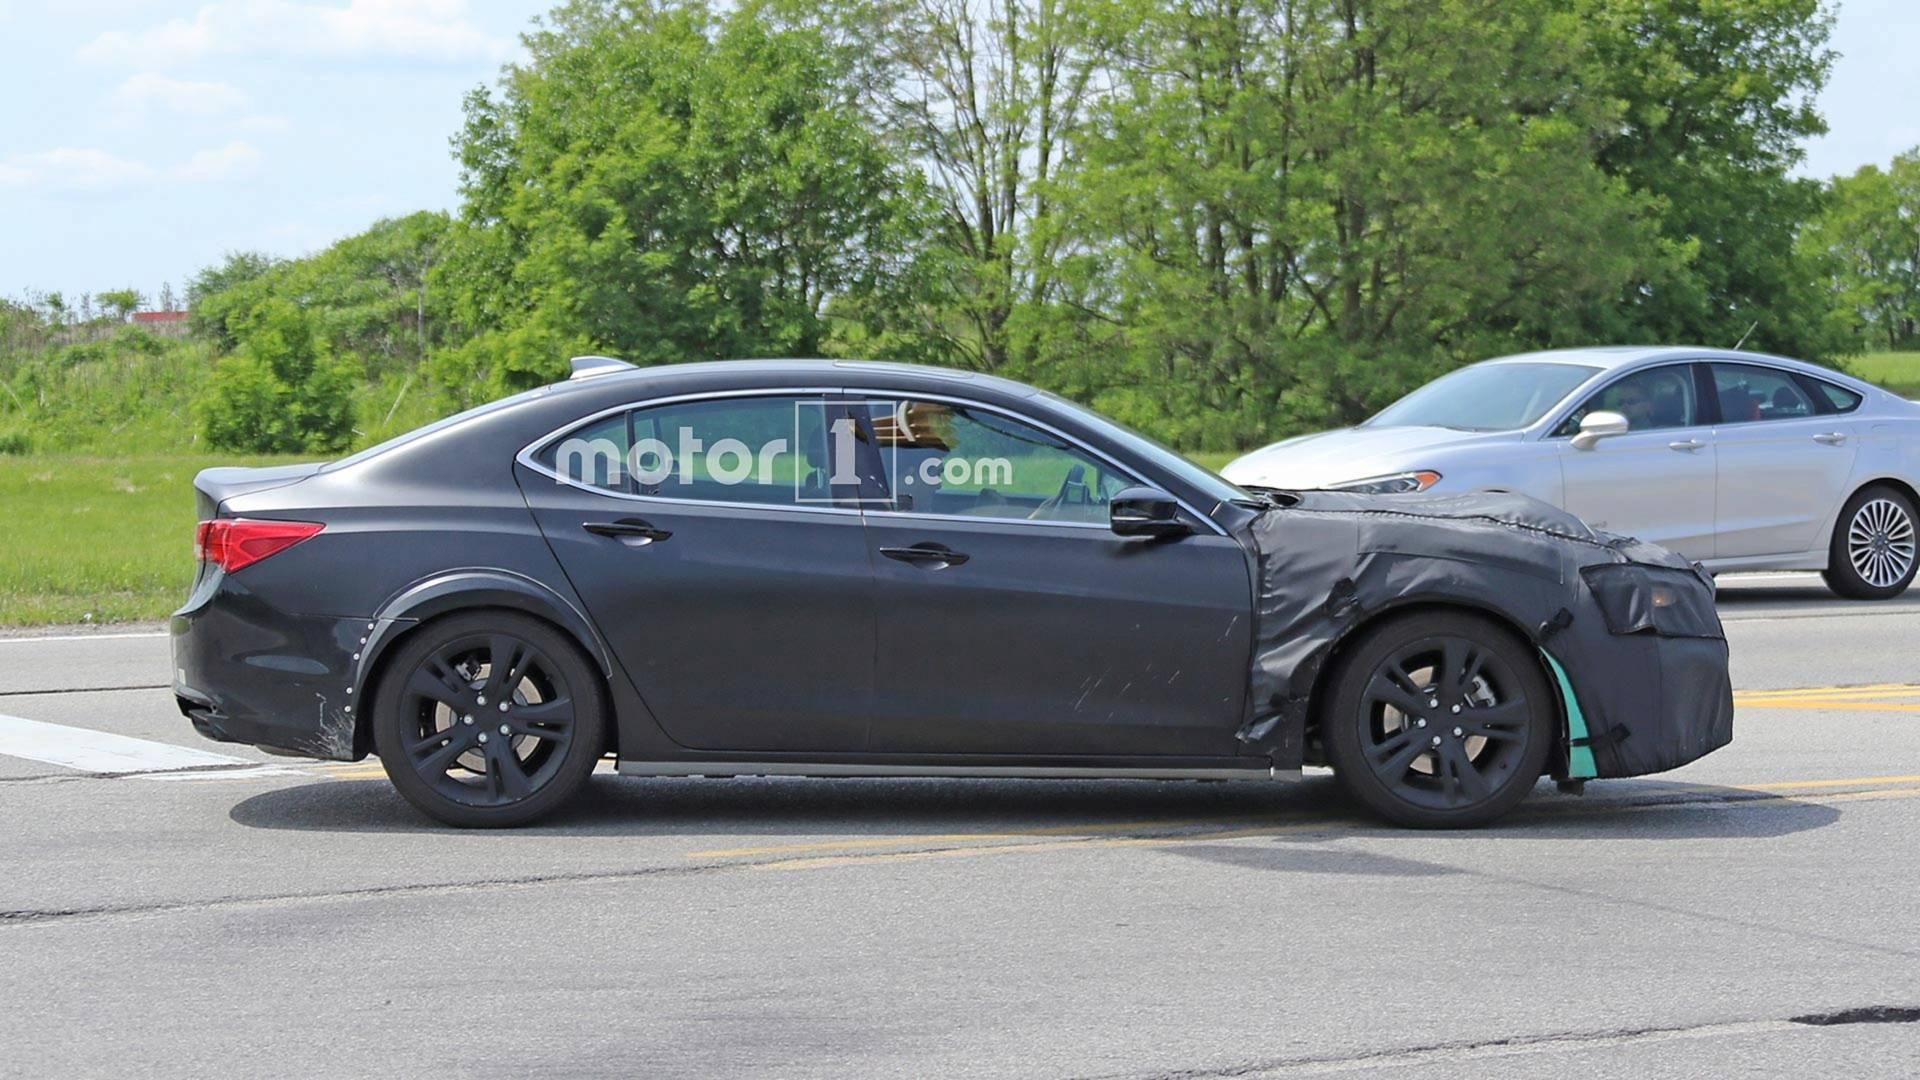 2020 - [Acura] TLX Acura-tlx-based-mule-spy-shots